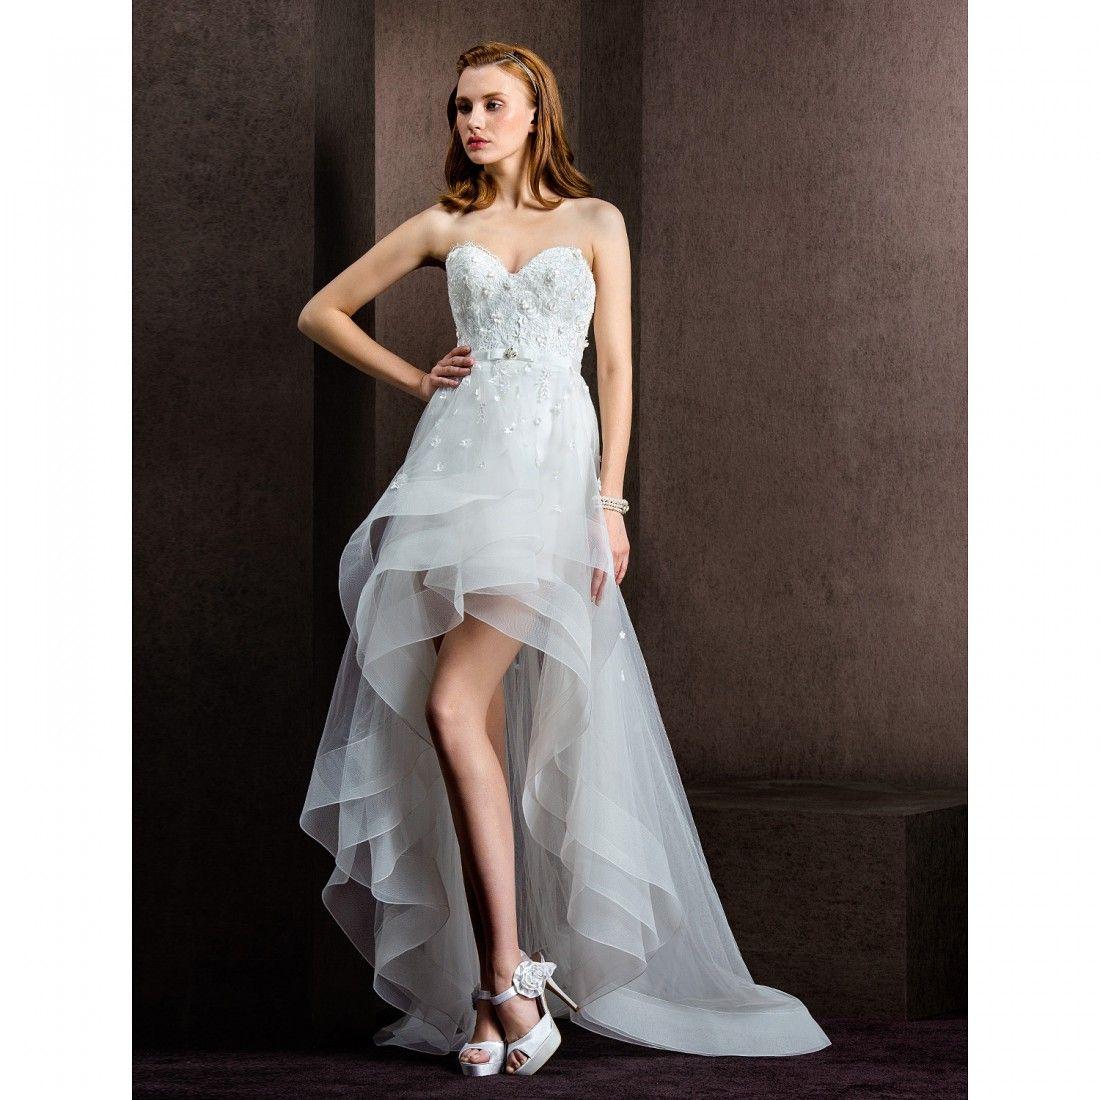 Mini wedding dresses  SheathColumn Sweetheart Tulle ShortMini Wedding Dress  Esküvő